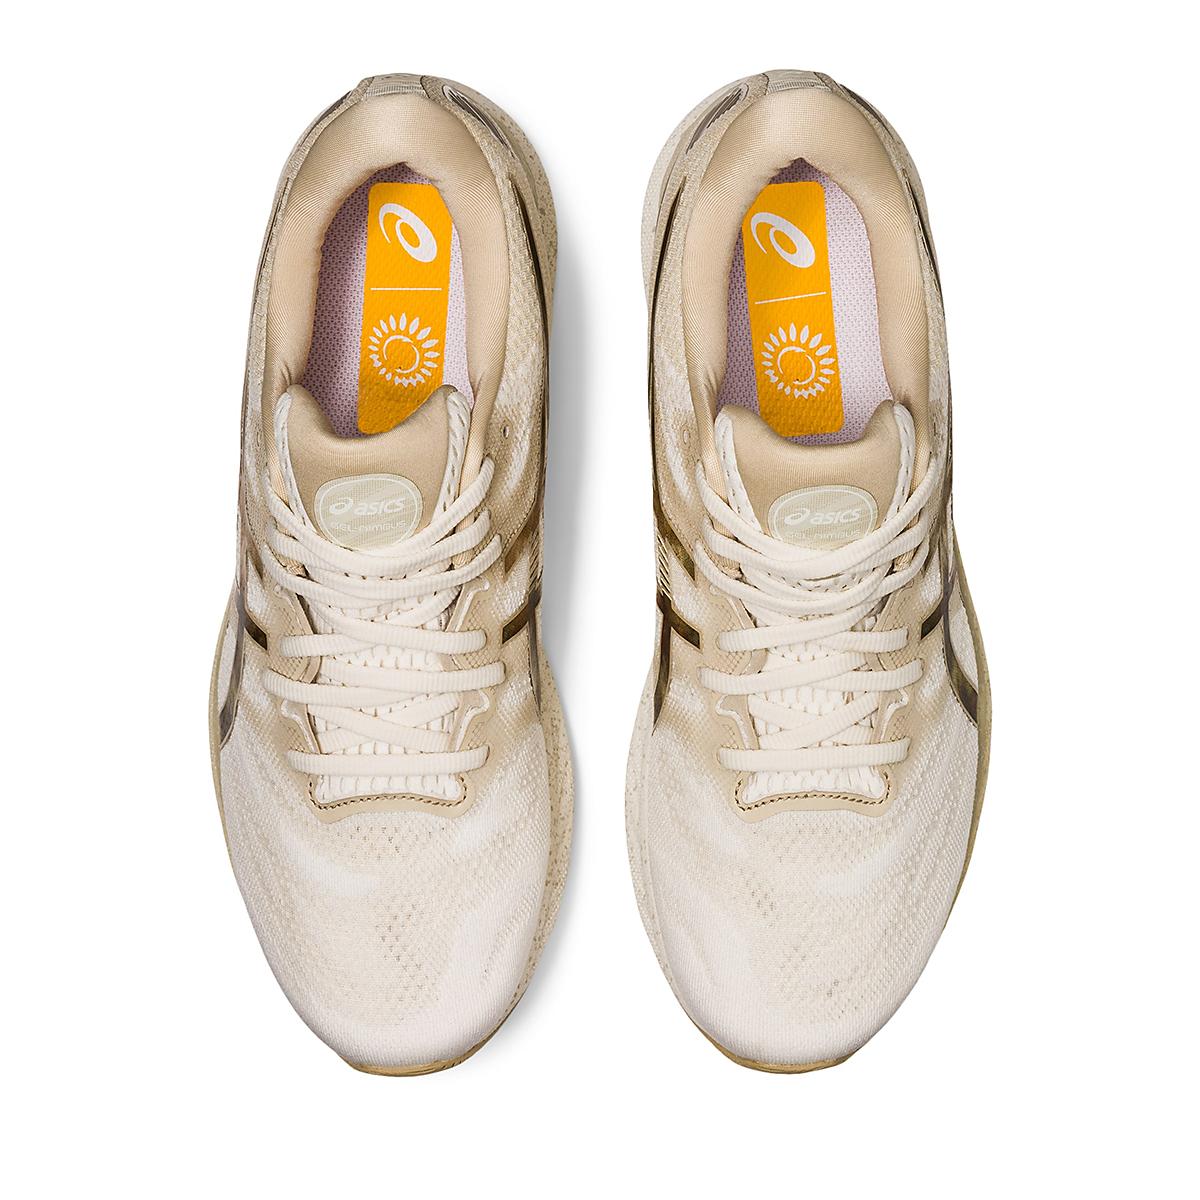 Men's Asics Gel-Nimbus 23 Earth Day Running Shoe - Color: Cream/Putty - Size: 7 - Width: Regular, Cream/Putty, large, image 3